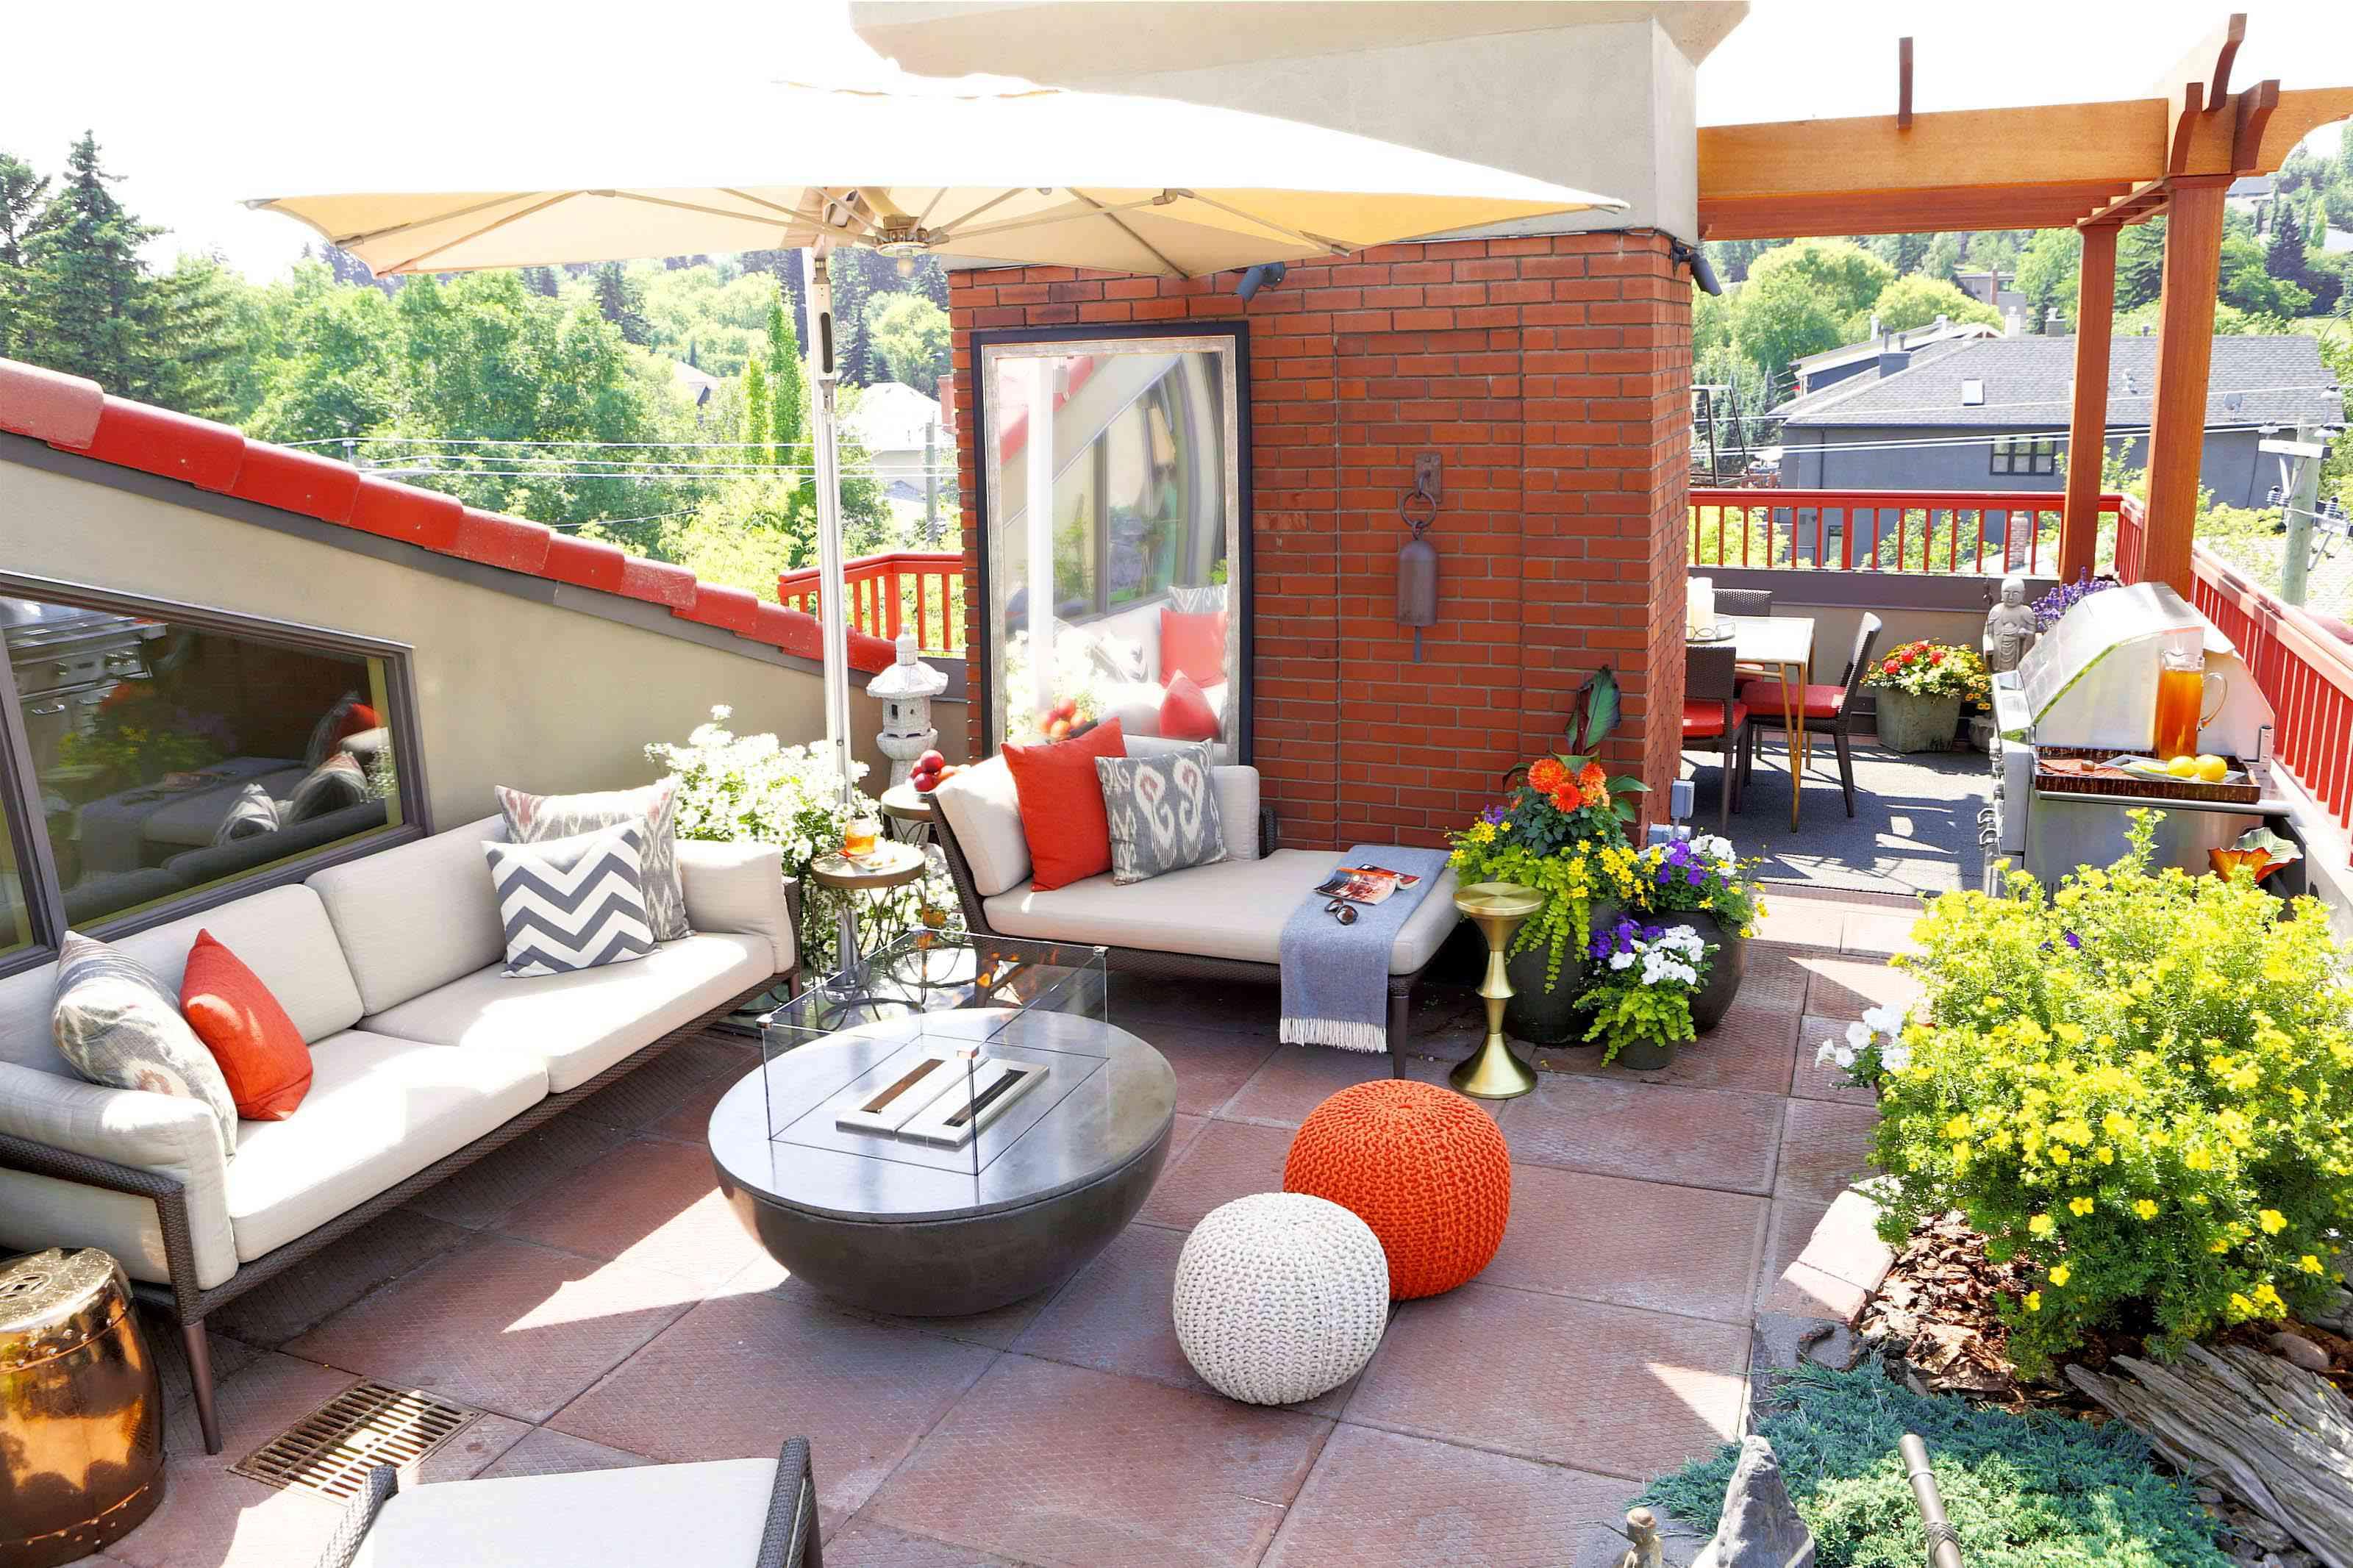 Reena Sotropa backyard design.